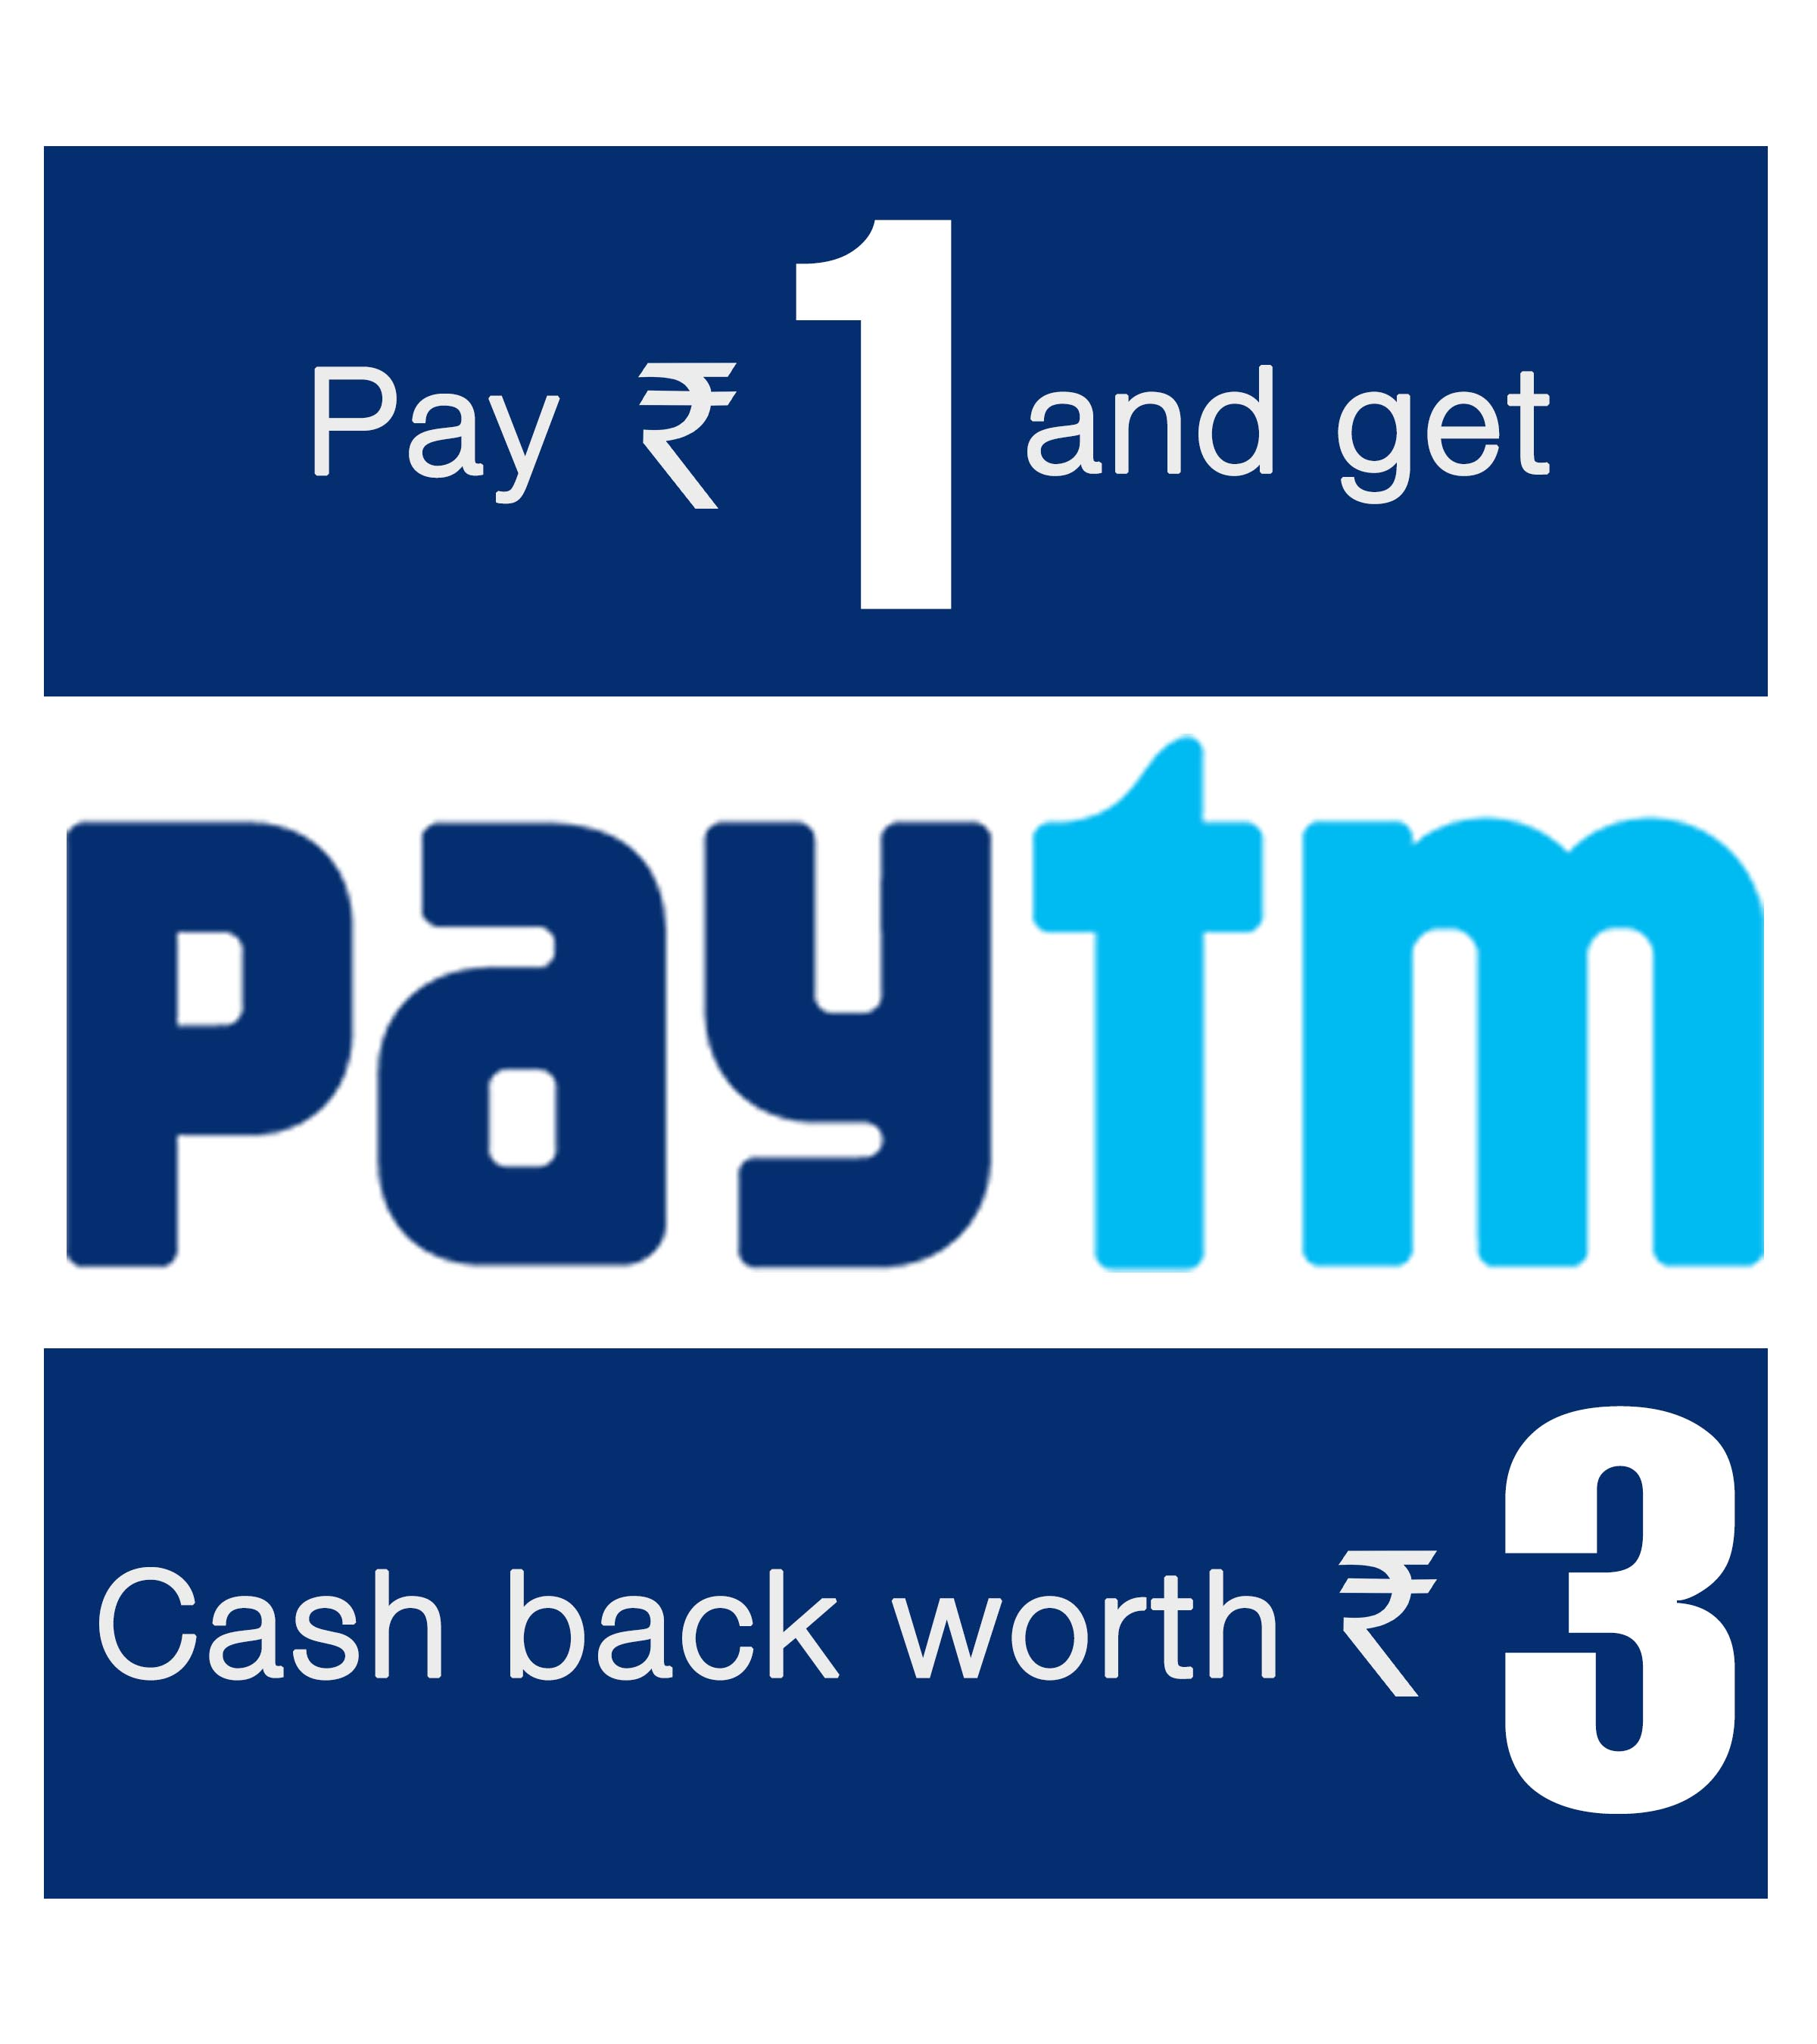 PayTm Cash Offer